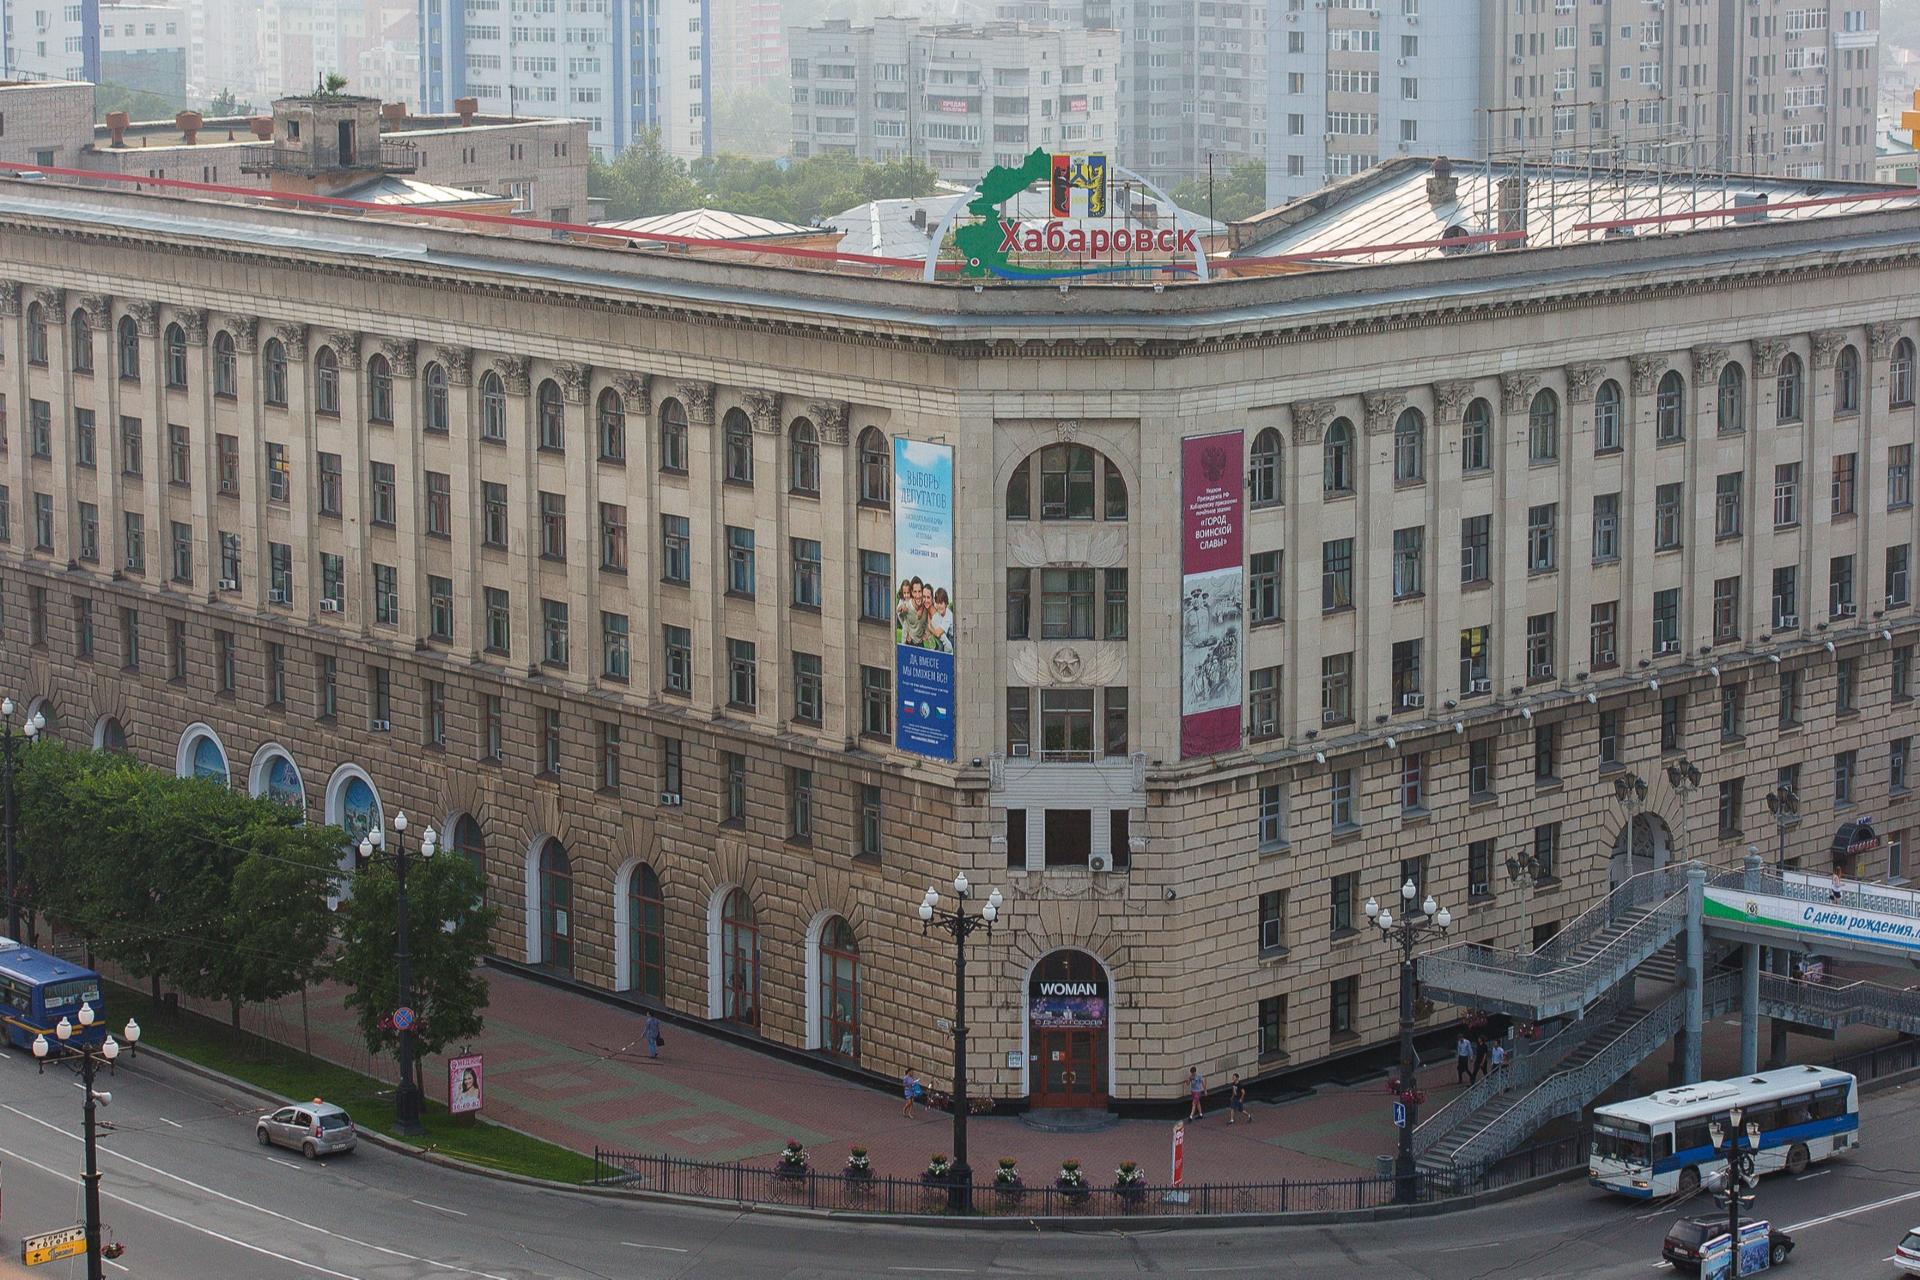 Фото: Александр Савченко/ИТАР-ТАСС